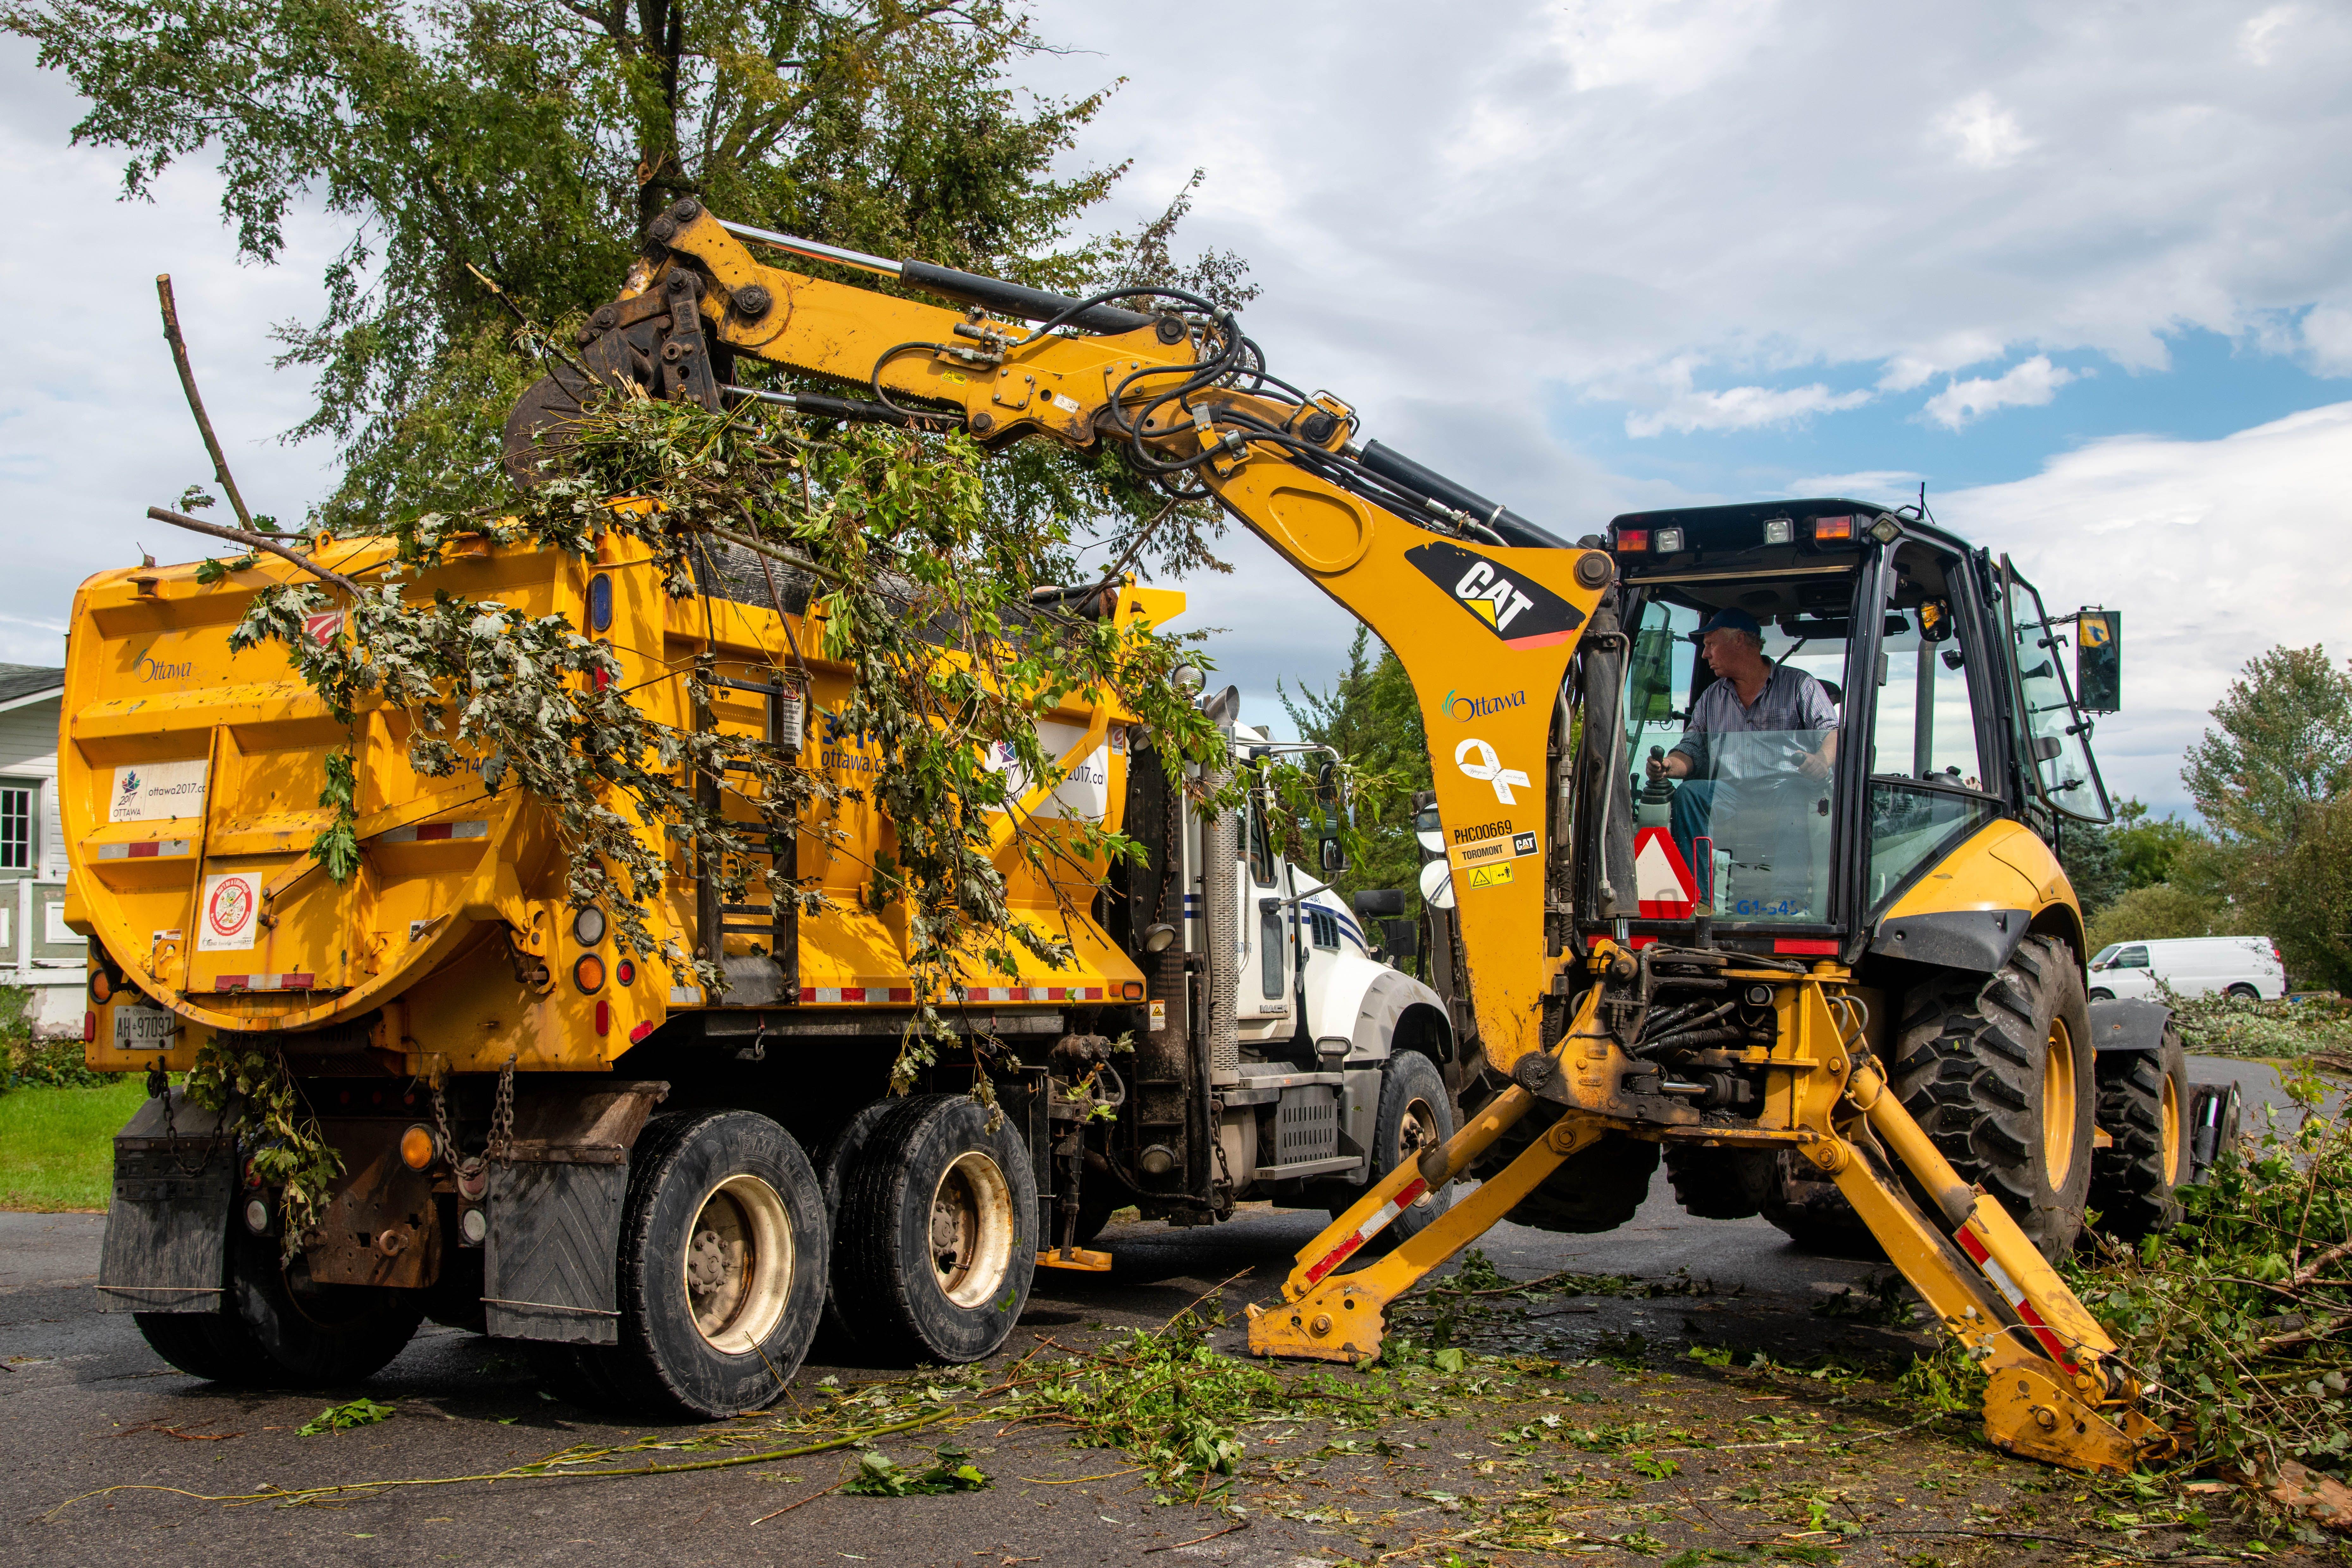 City machinery removing debris post tornado